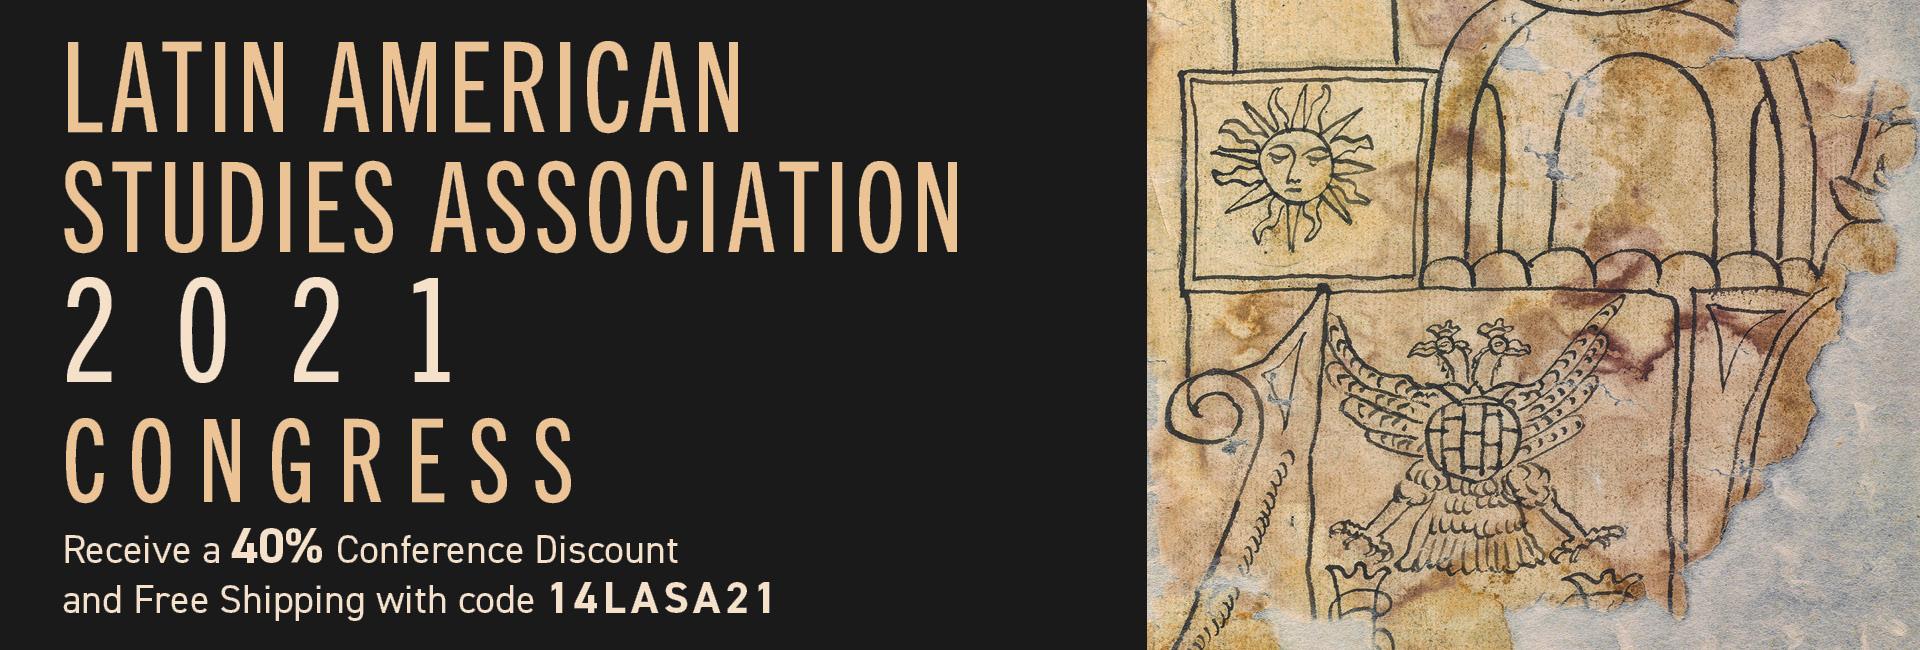 LASA slider_WEB_1920x650_for exhibit page